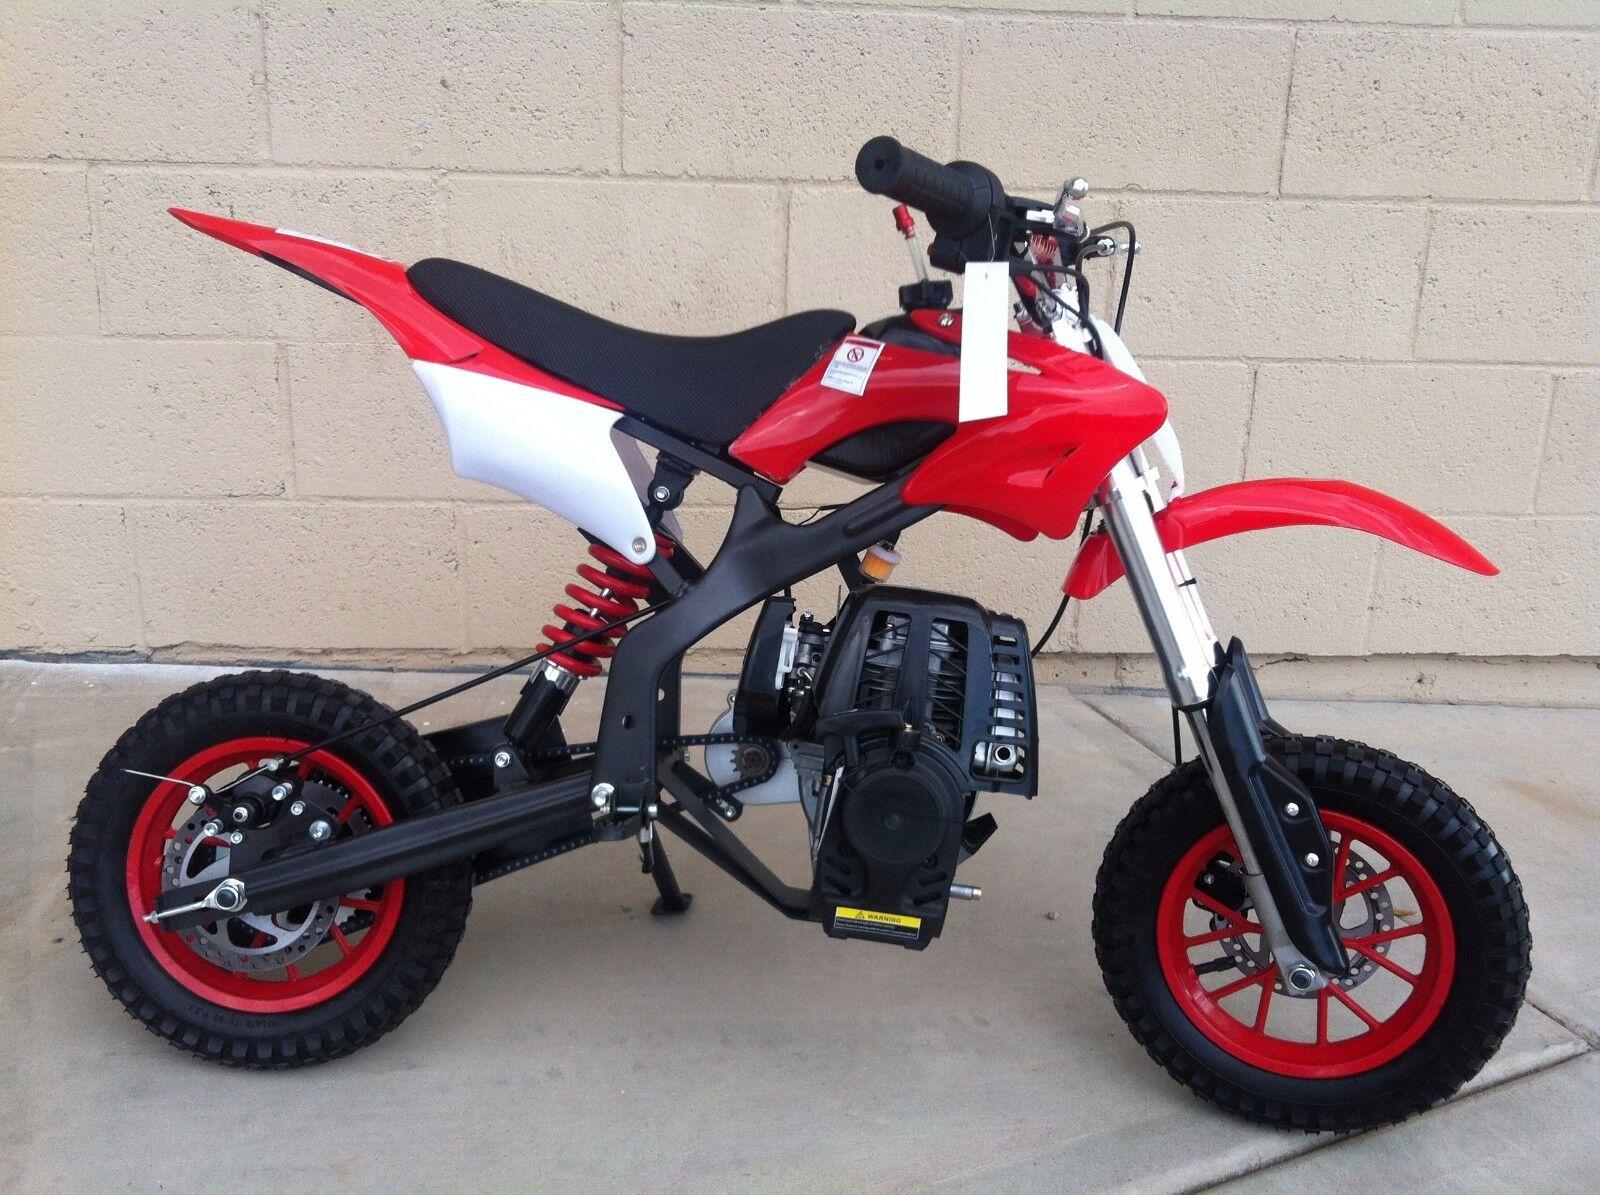 High Performance 4 Stroke 40cc Sportster Mini Dirt Bike - Red